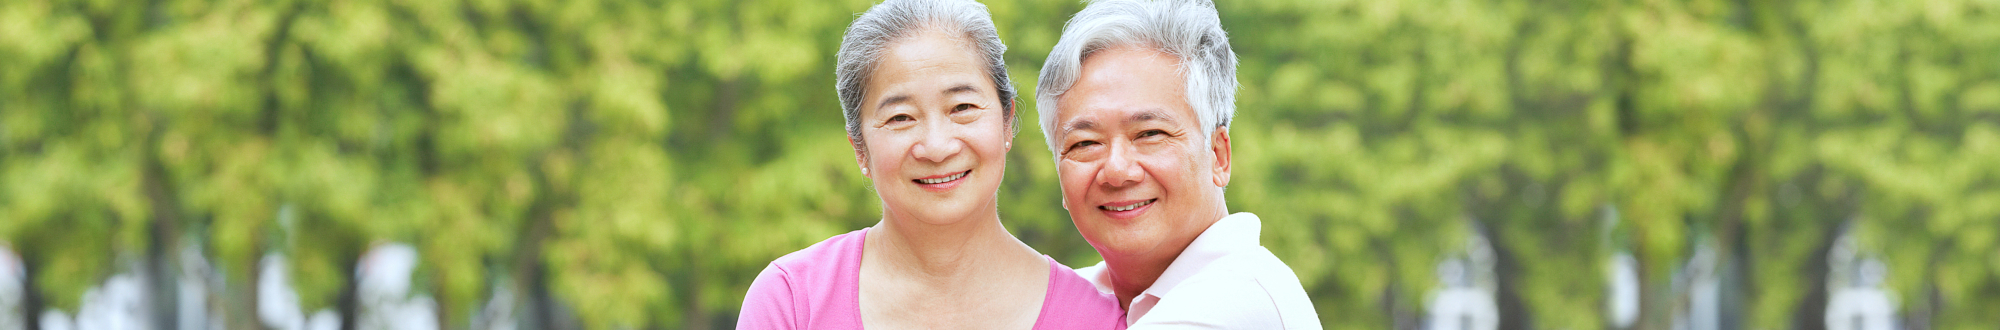 senior couple both smiling